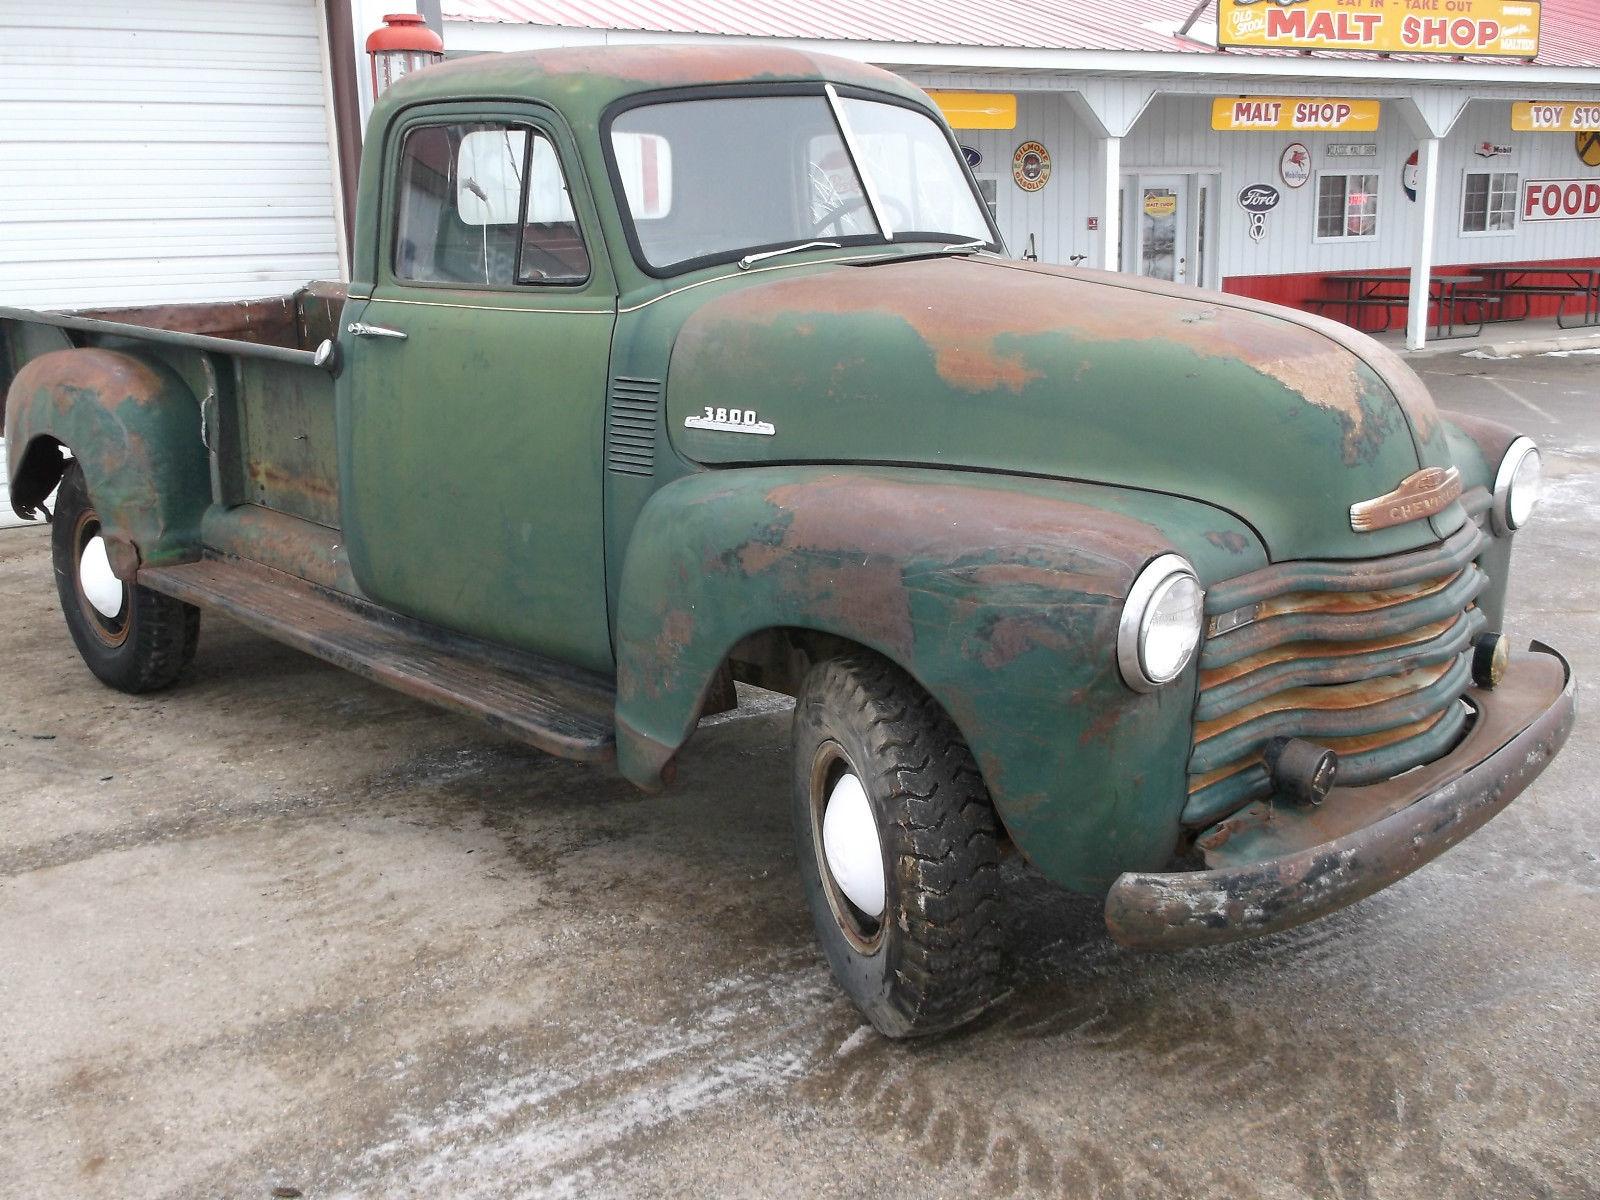 1953 chevy pickup truck 3800 model rare 9 foot box original farm truck rat rod classic. Black Bedroom Furniture Sets. Home Design Ideas